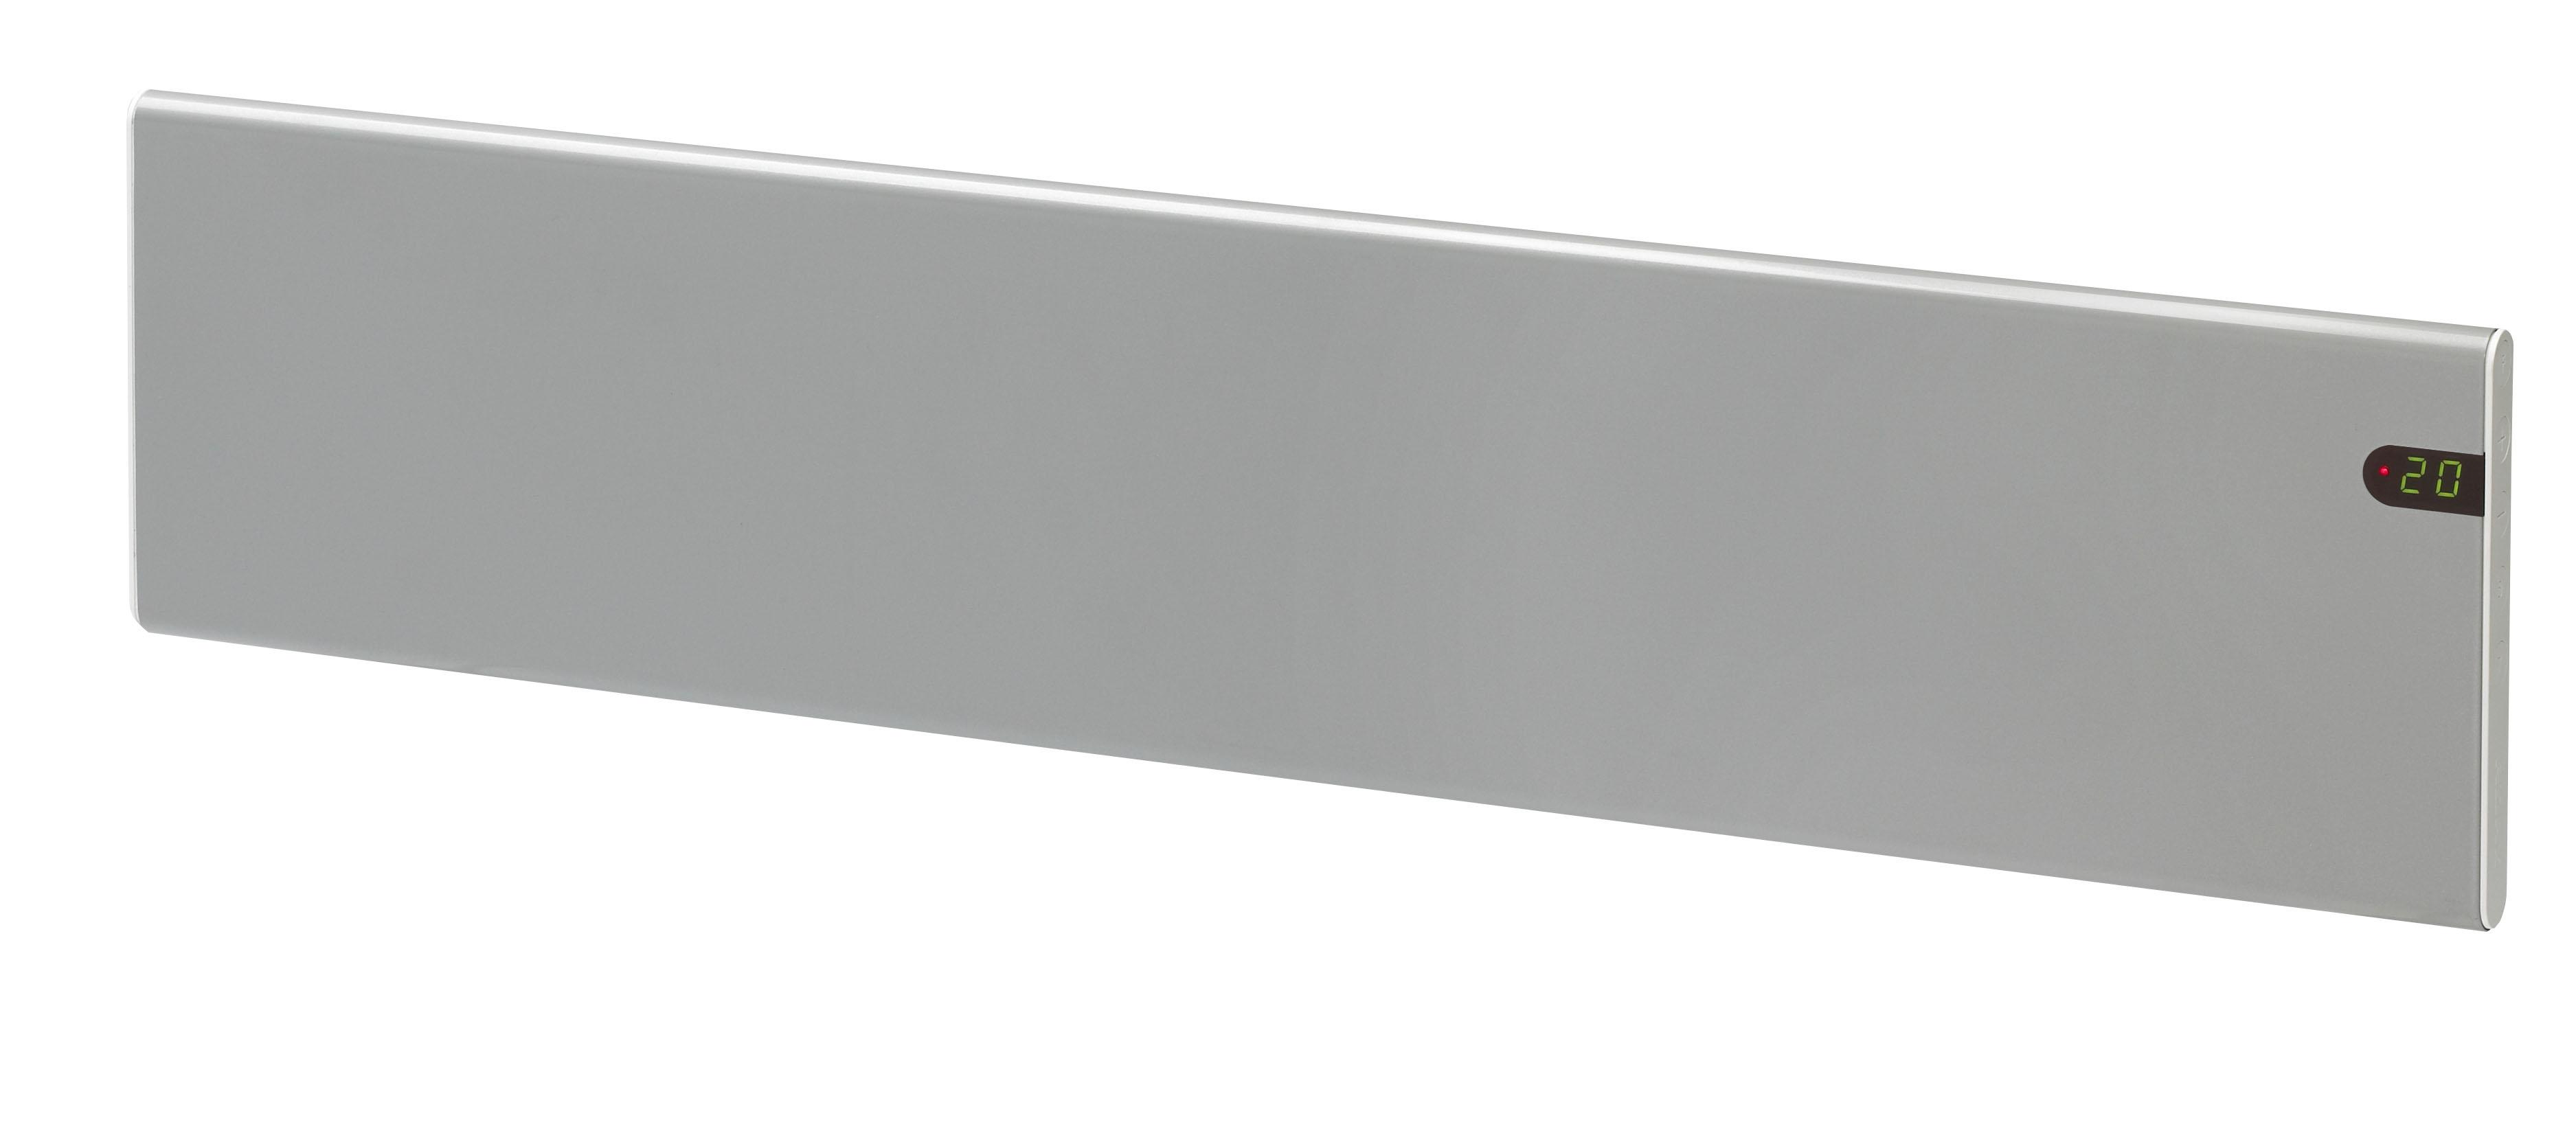 Elektrinis radiatorius ADAX NEO NL 06 KDT Silver